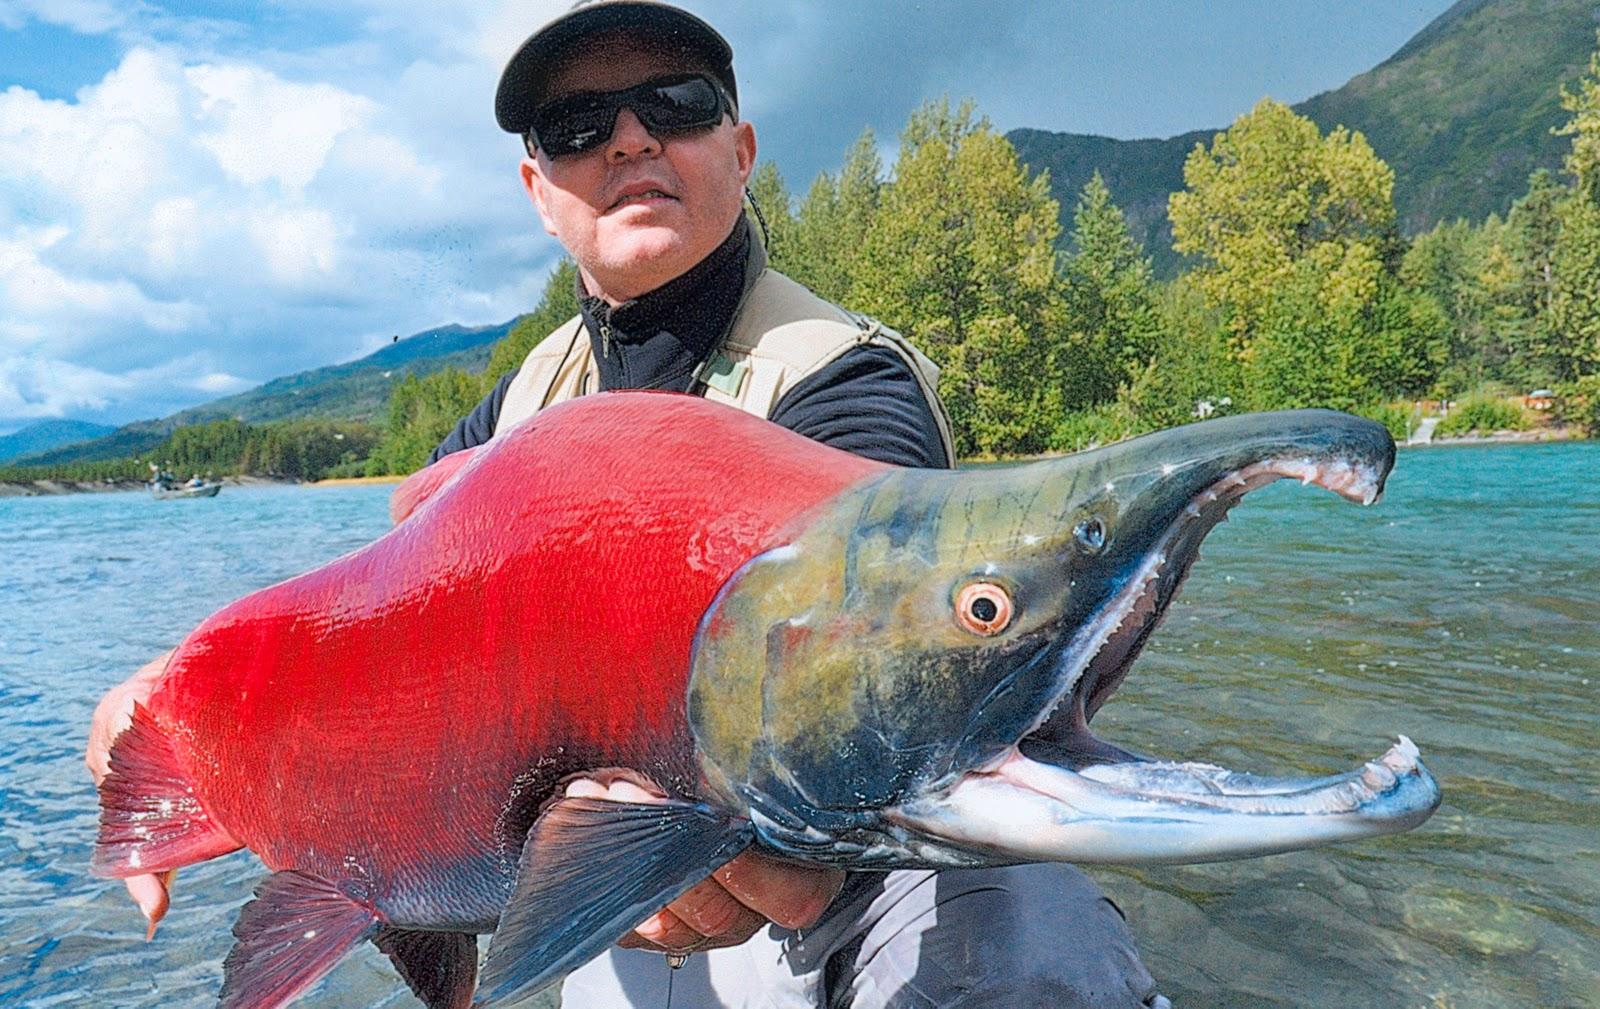 Sockeye salmon fish